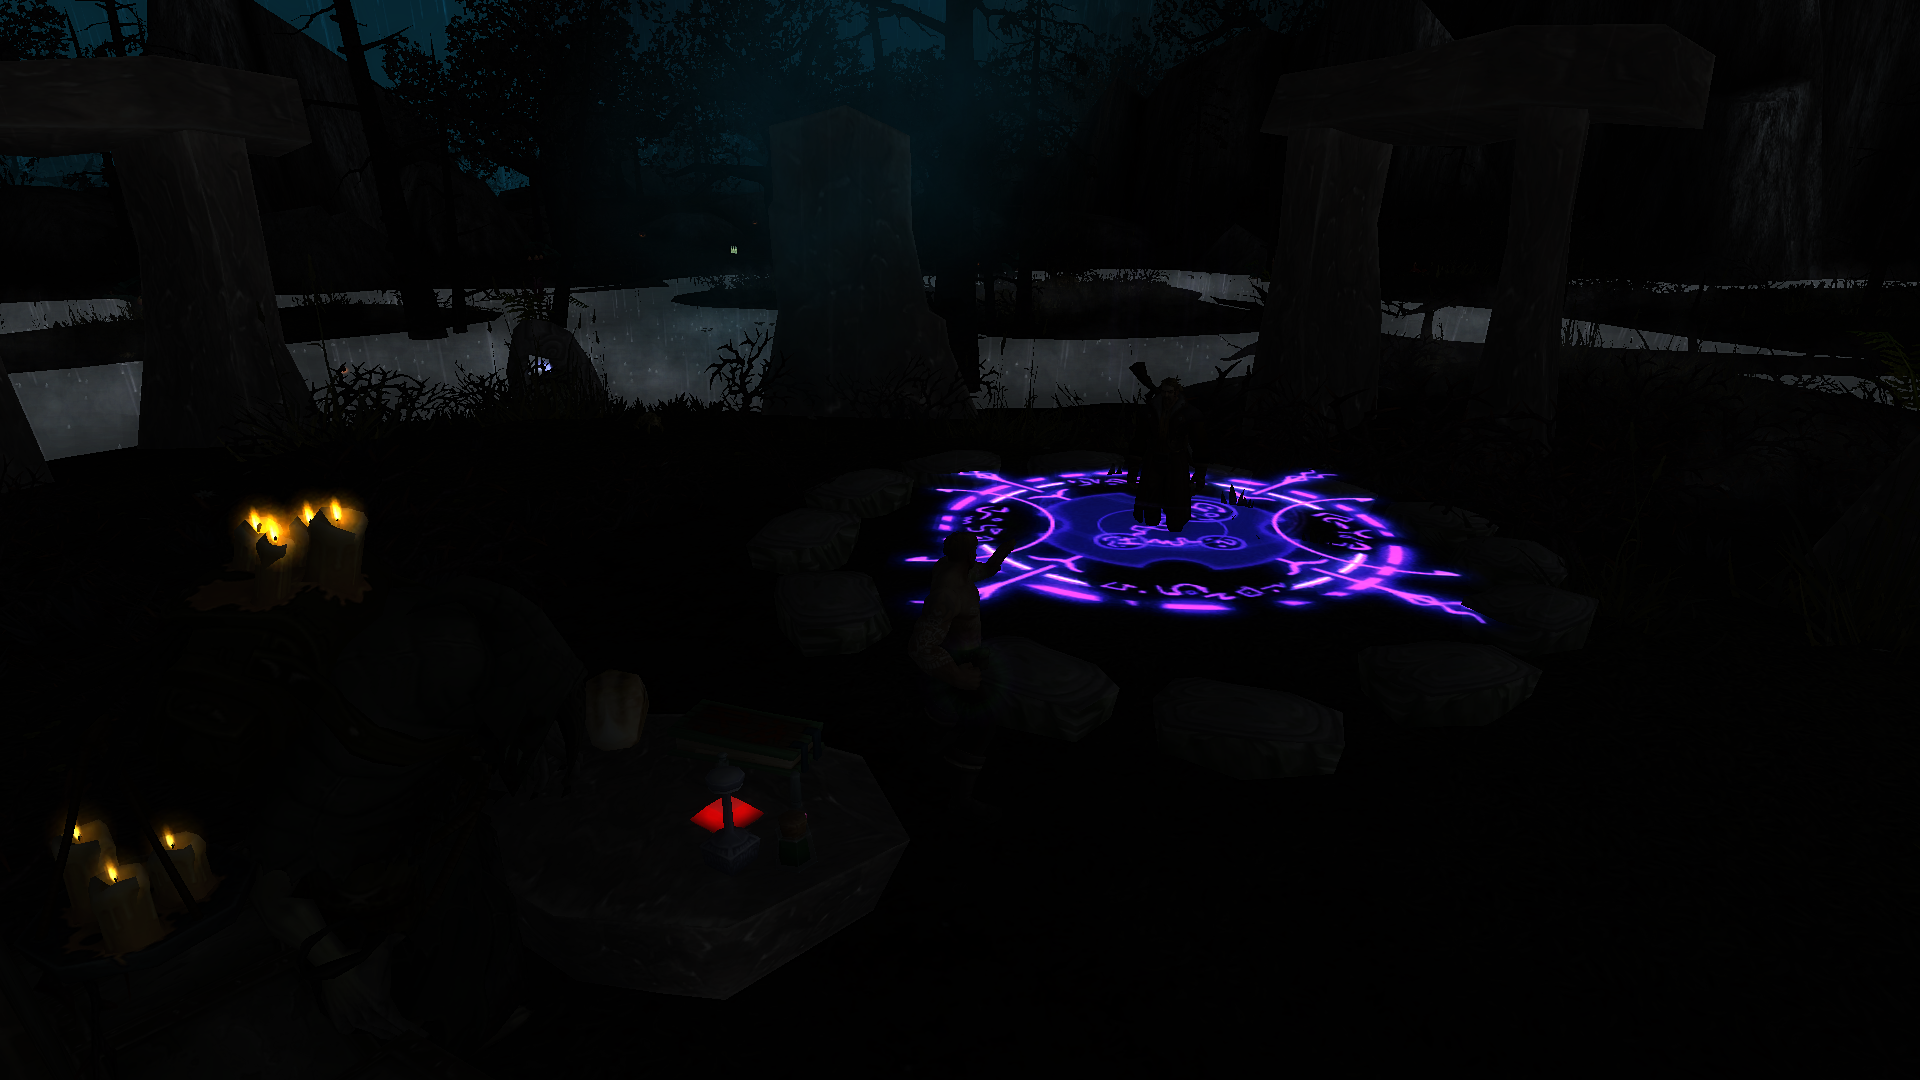 World_Of_Warcraft_Screenshot_2019.10.15_-_19.45.37.43.png